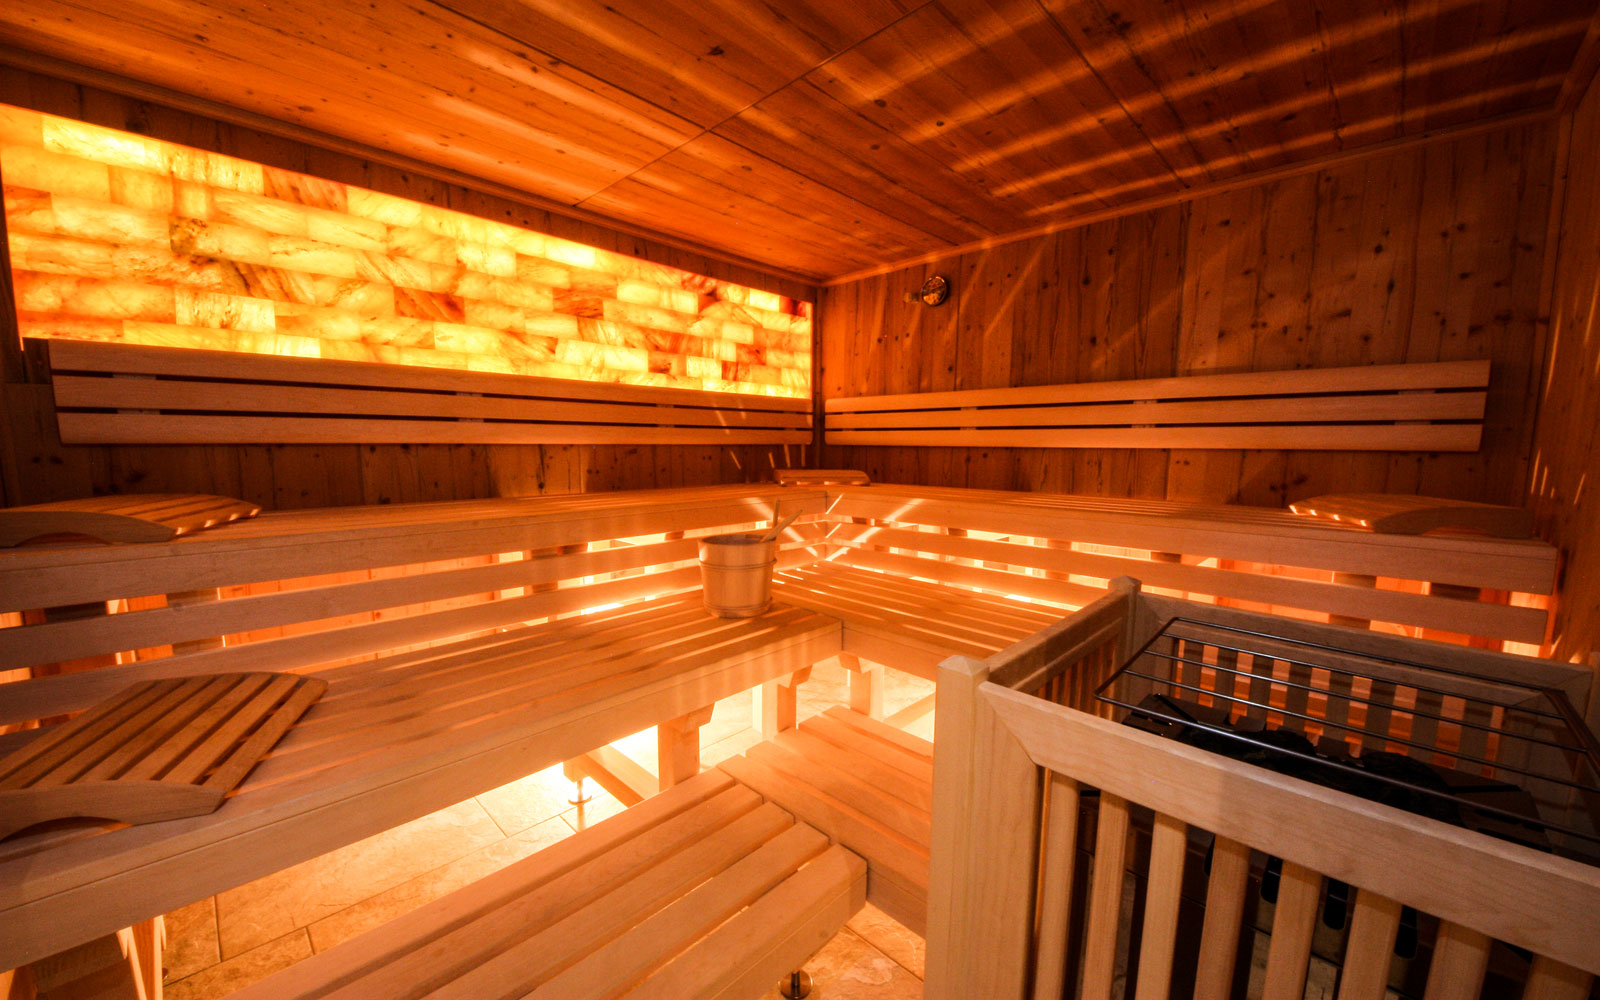 sauna selber machen finest badezimmer deko selber machen schn waschbecken ideen d deko ideen. Black Bedroom Furniture Sets. Home Design Ideas